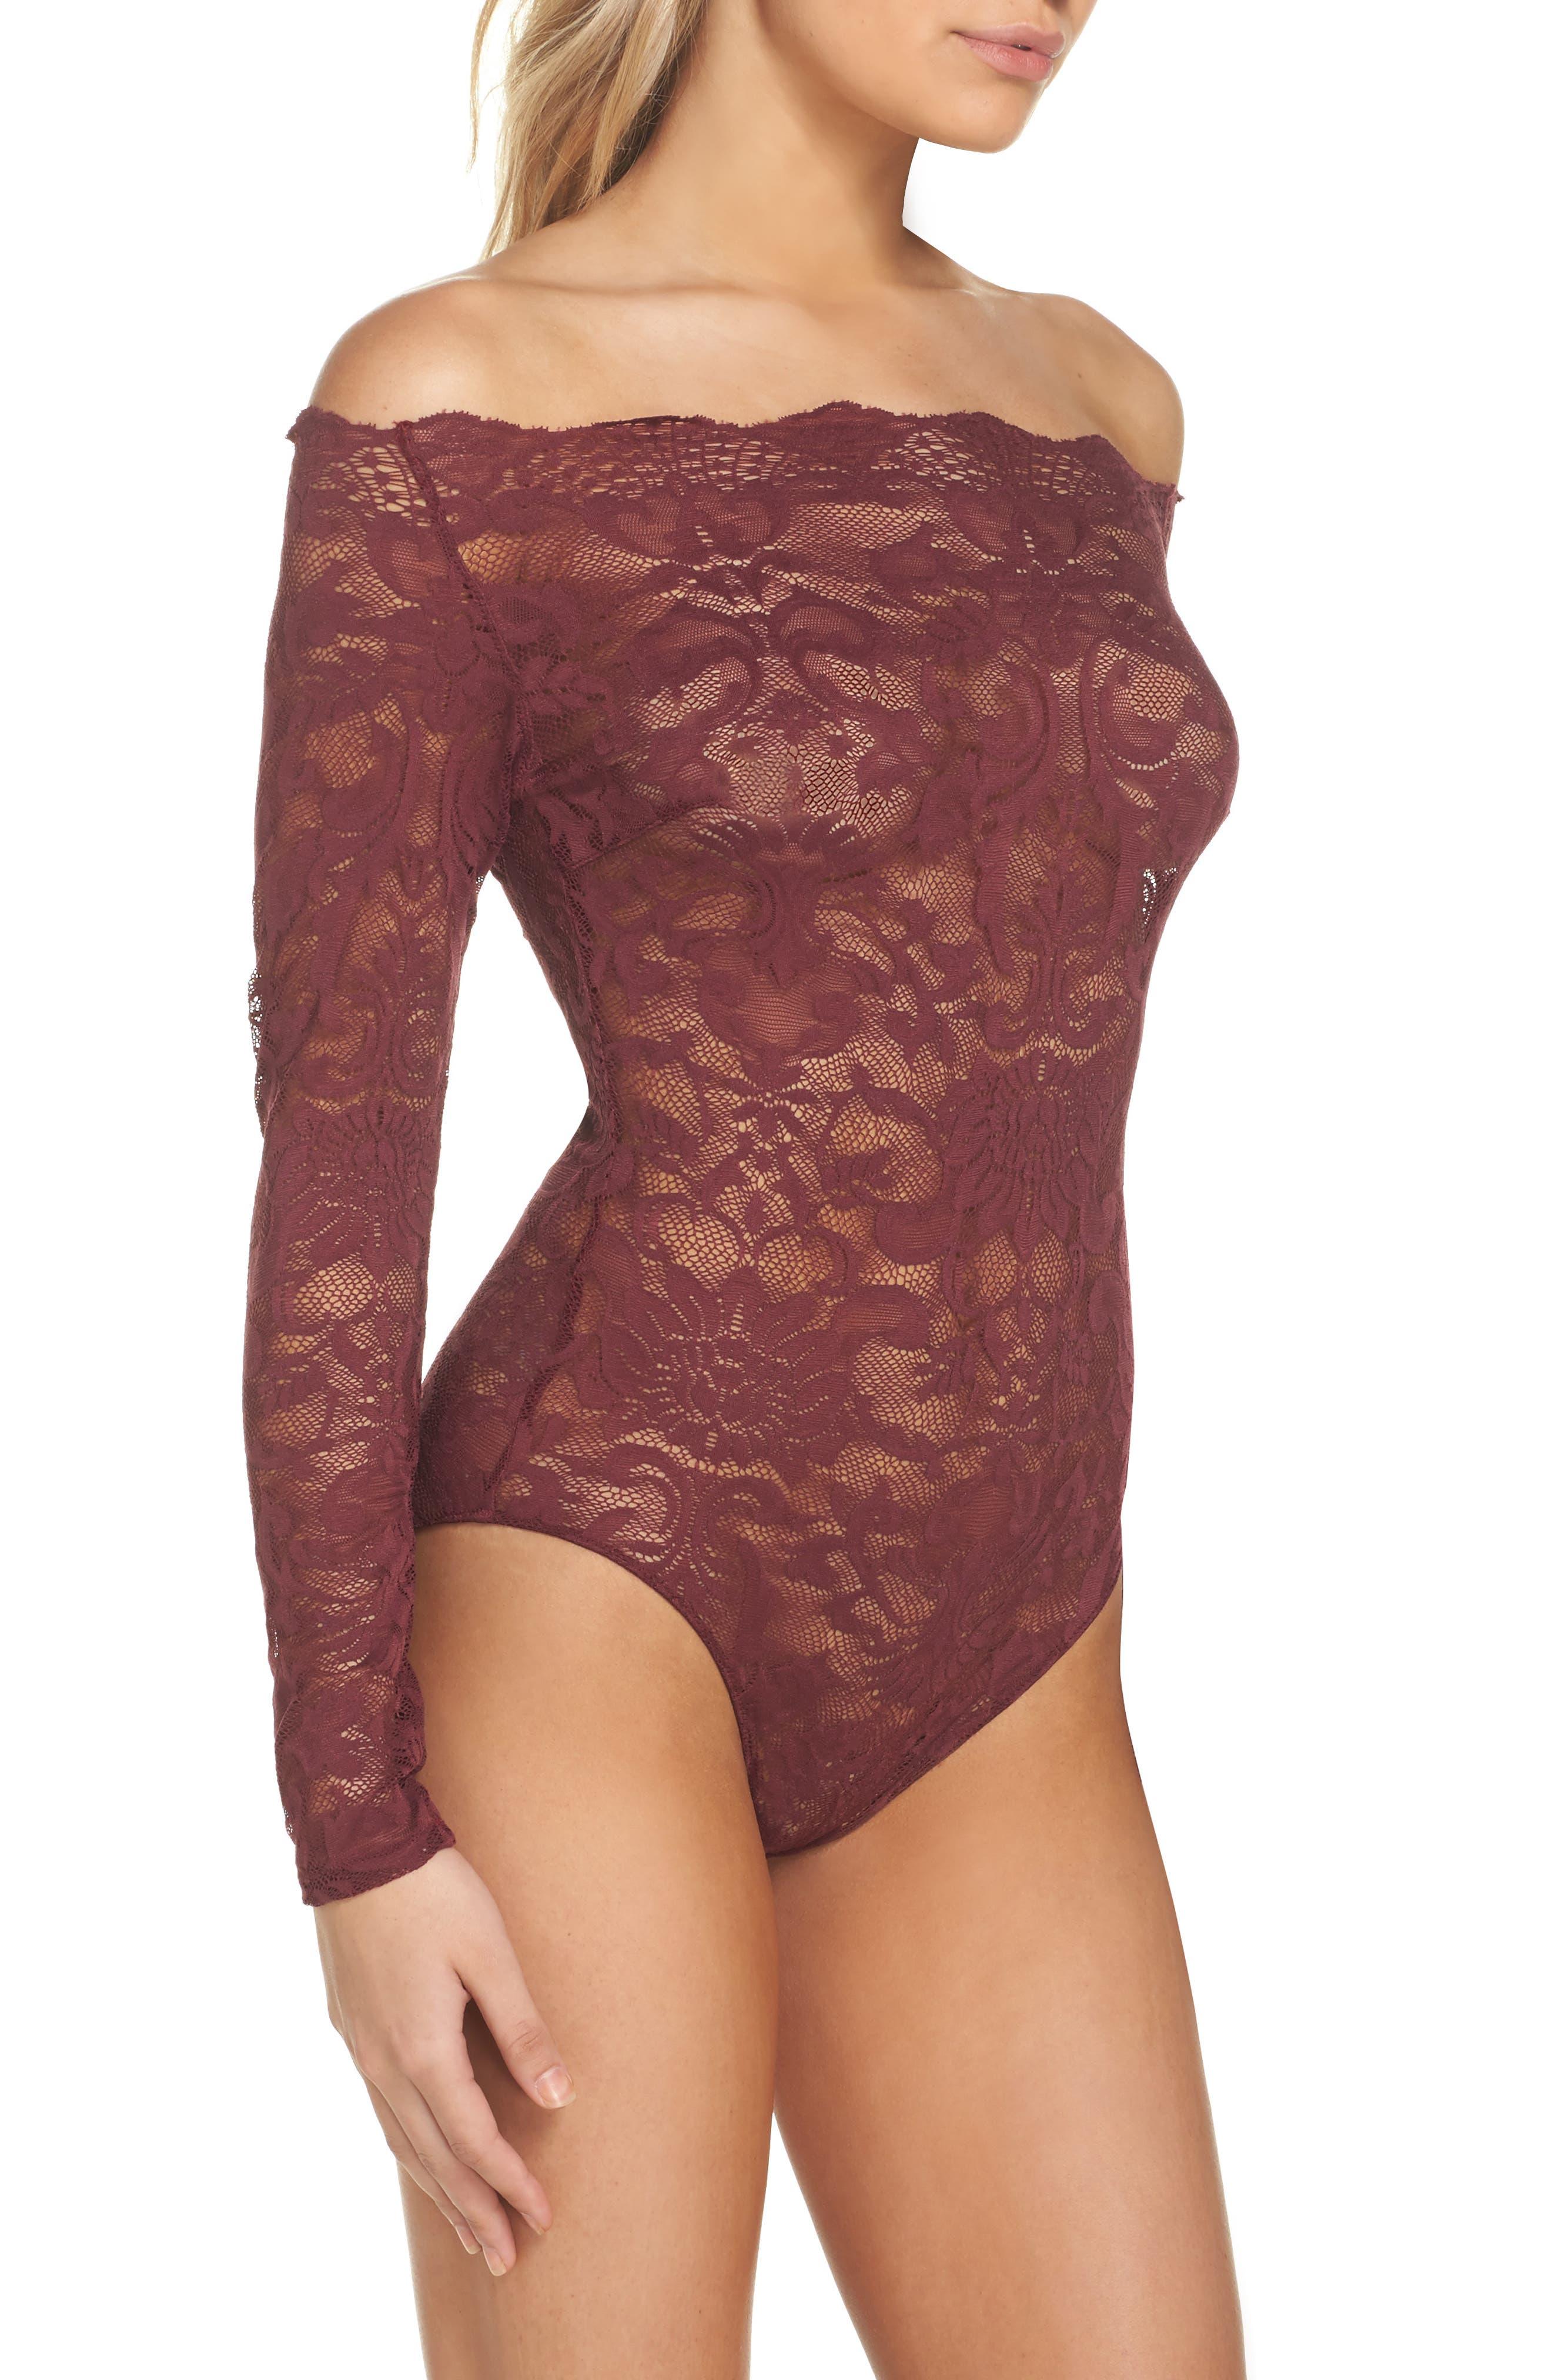 Eliza Off the Shoulder Lace Bodysuit,                             Alternate thumbnail 3, color,                             Tawny Port